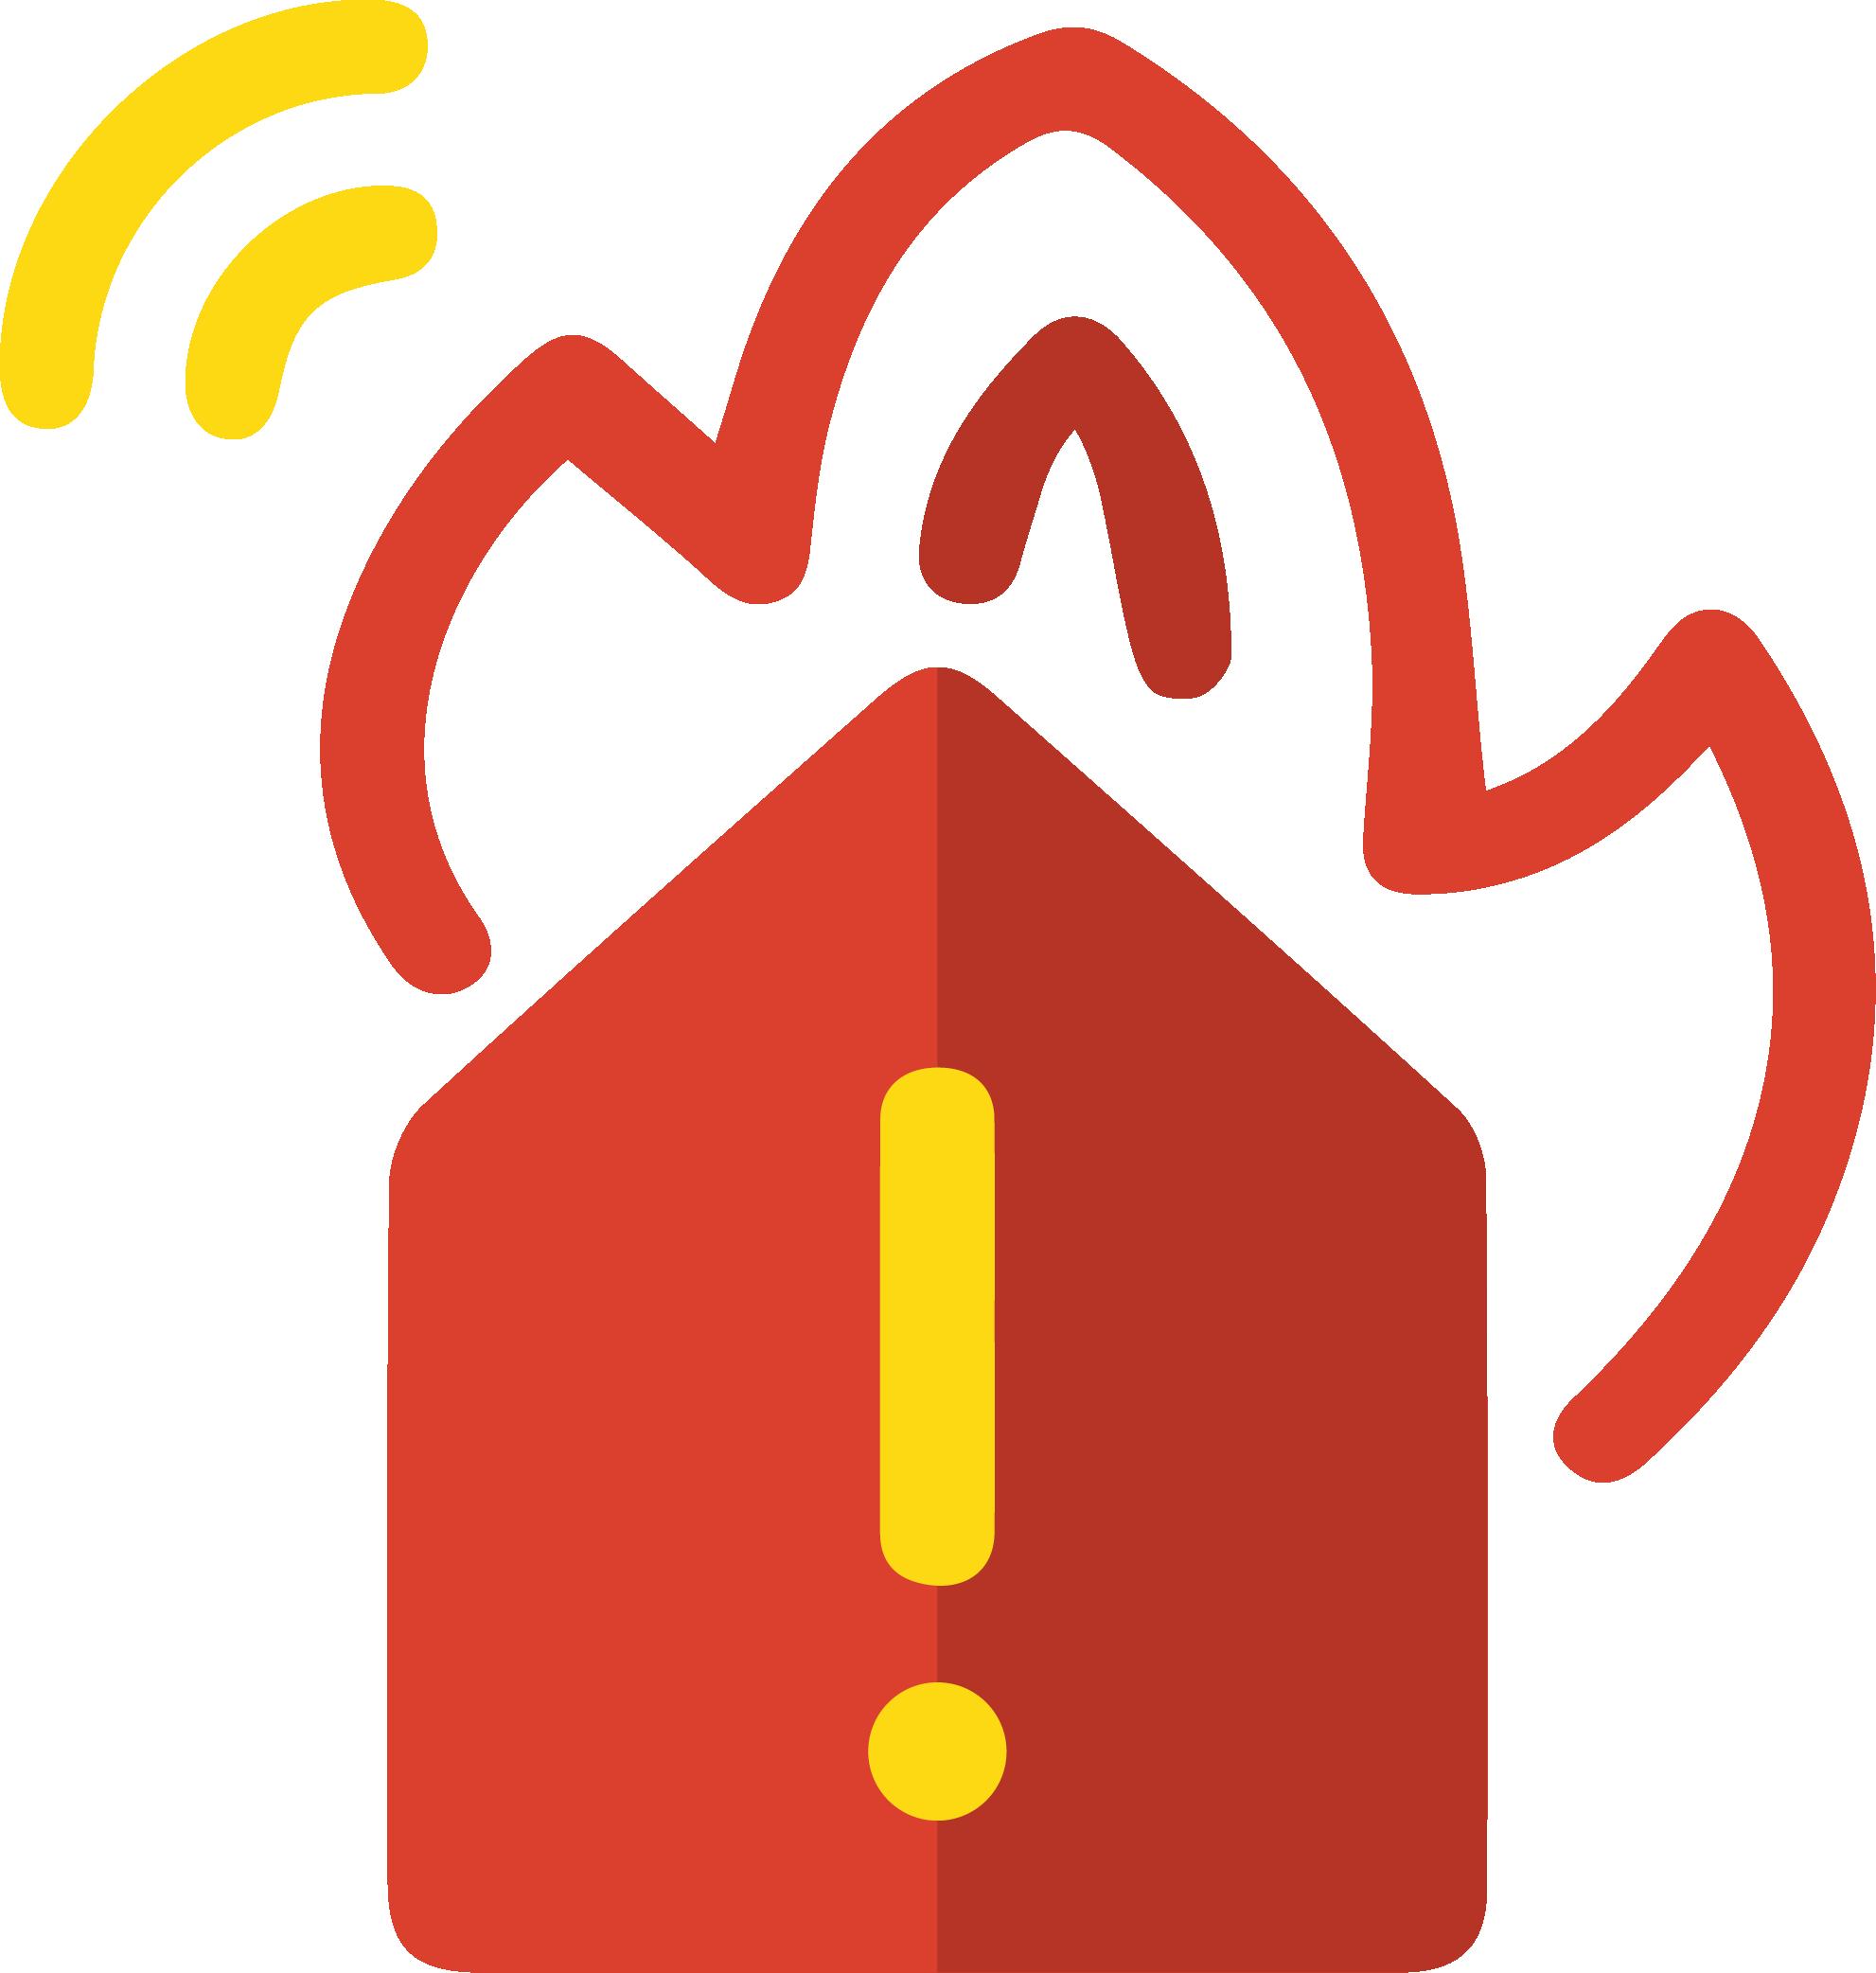 Korsmeyer Fire Protection